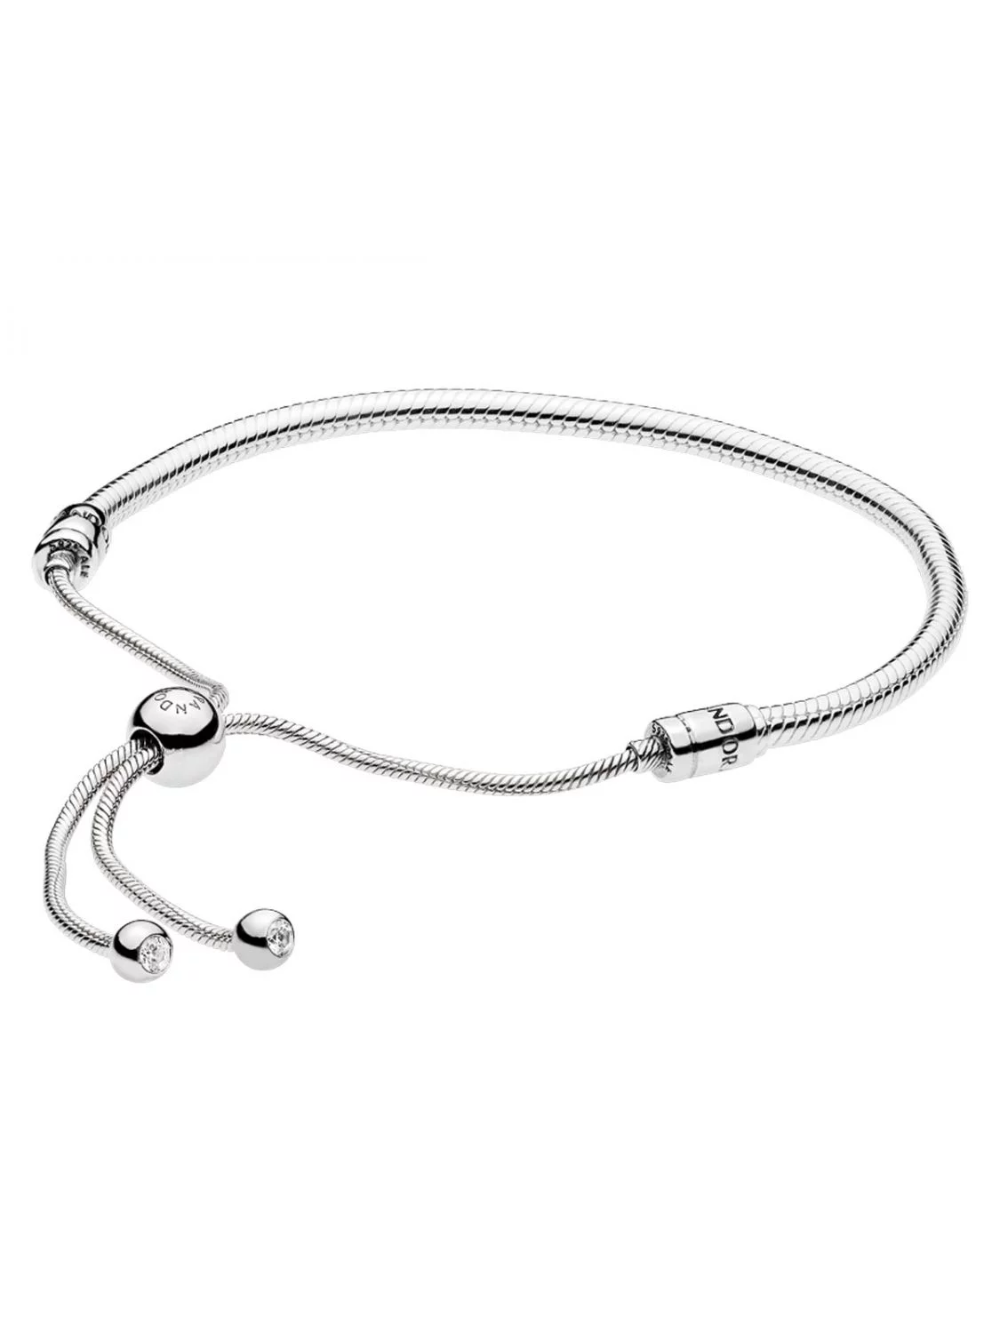 PANDORA 597125CZ Armband Moments Silver Sliding | Pandora armband ...